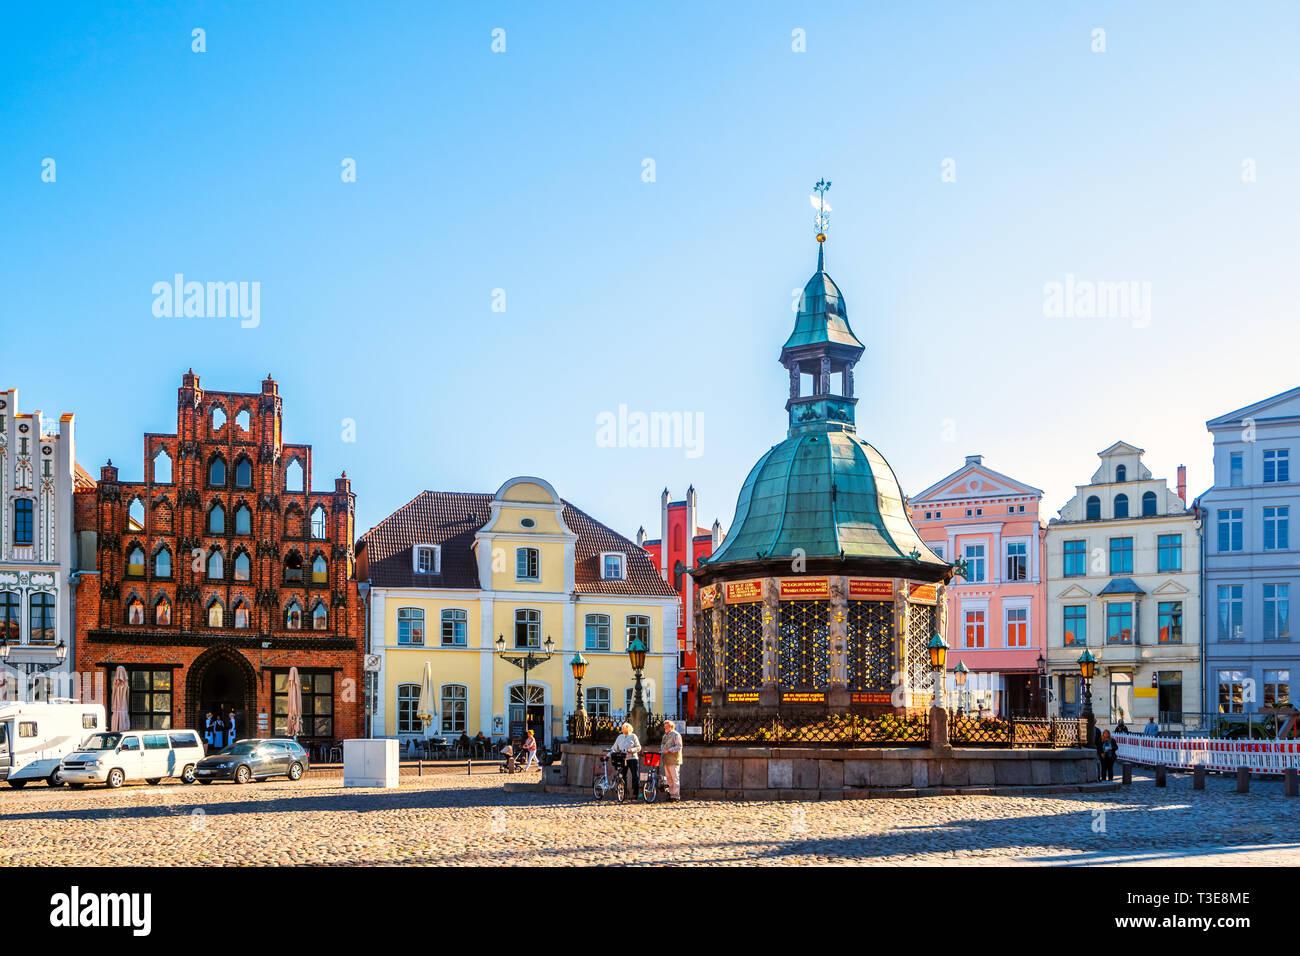 Market of Wismar, Germany - Stock Image